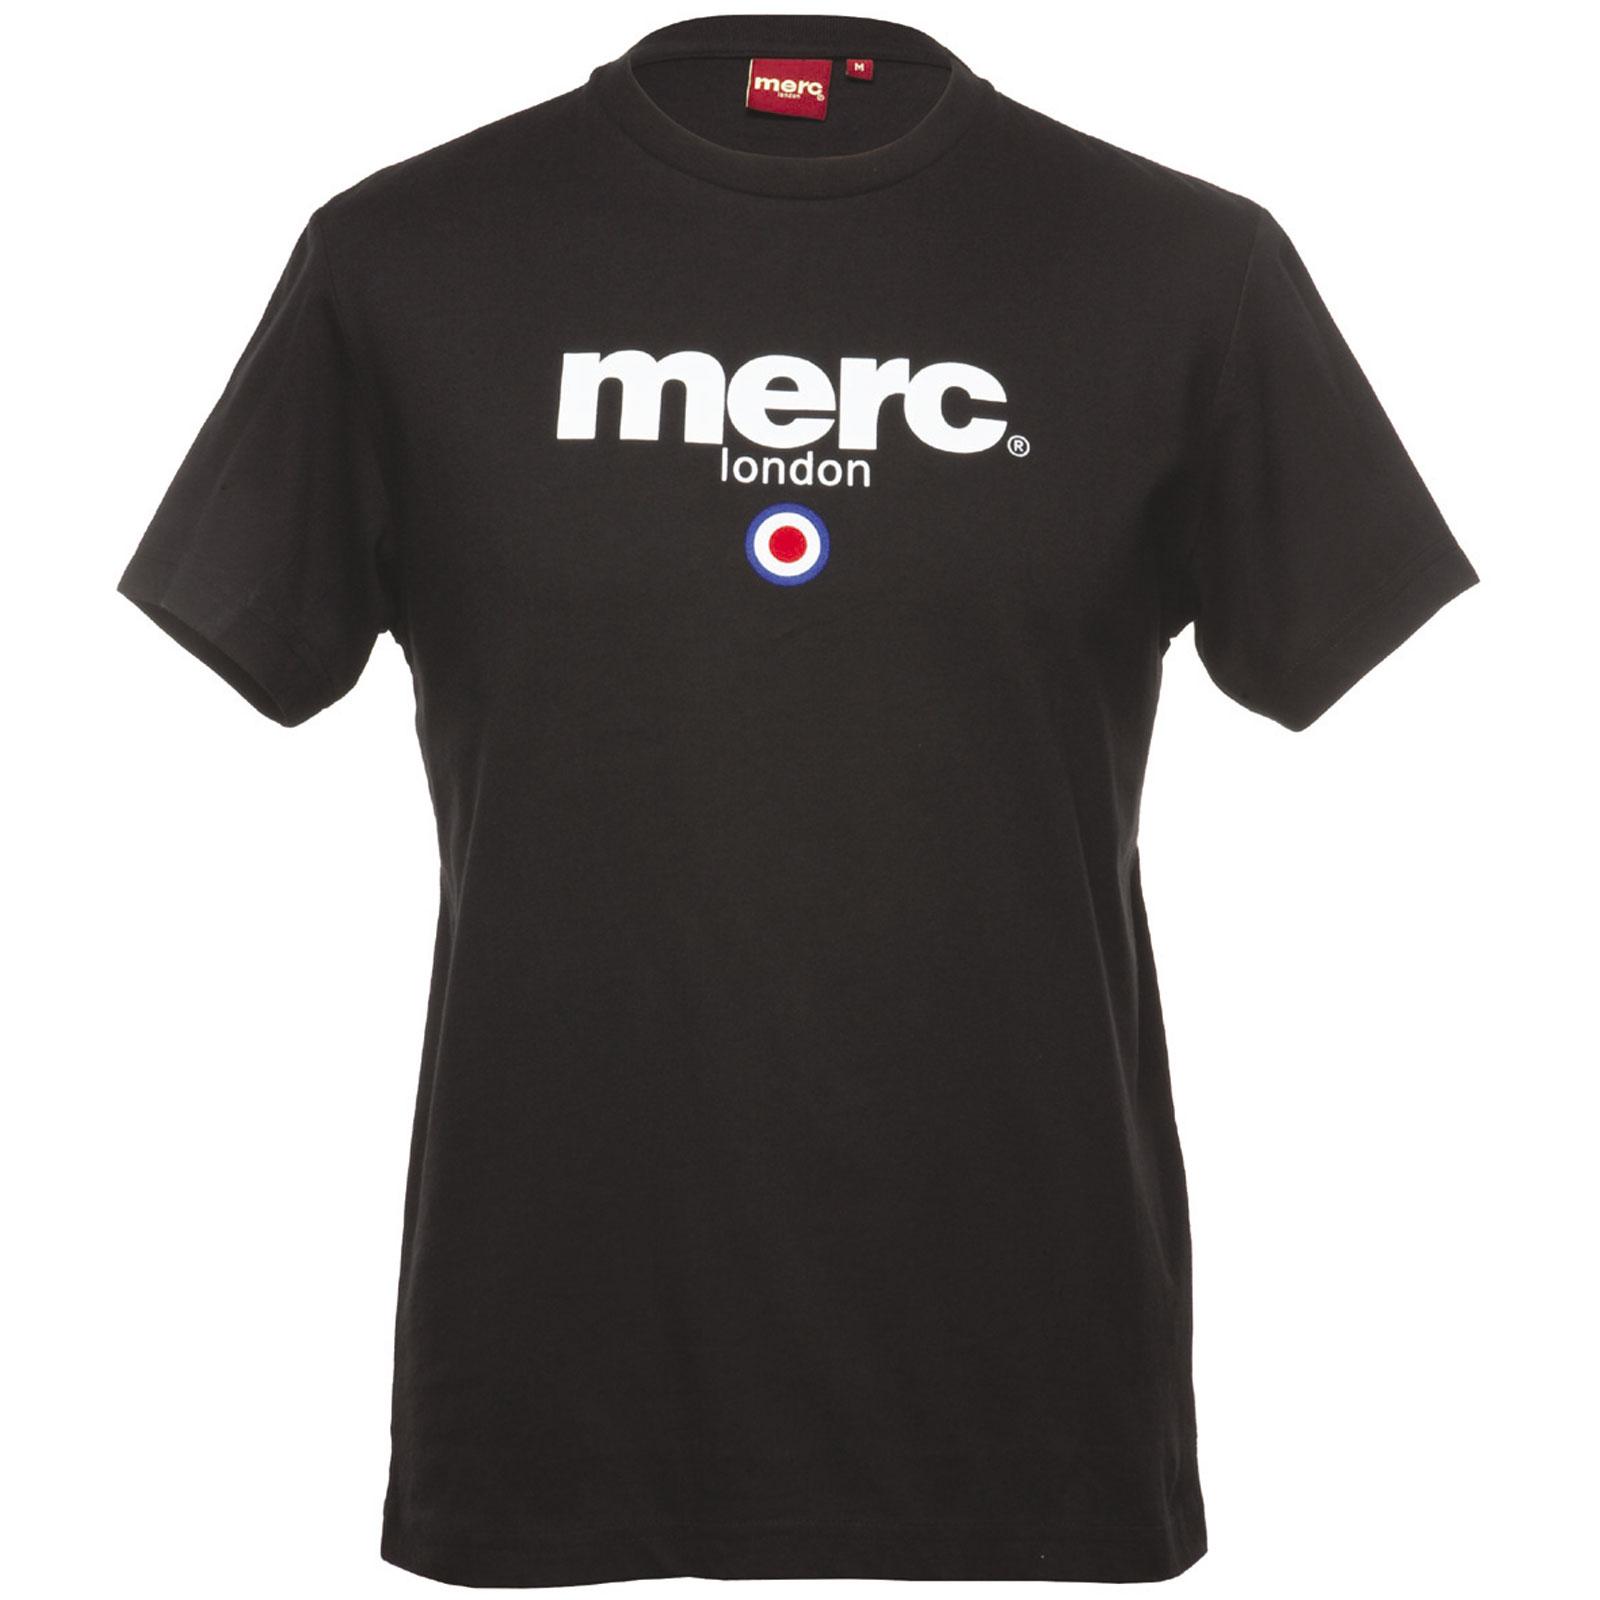 Koszulka MERC LONDON BRIGHTON   Czarna